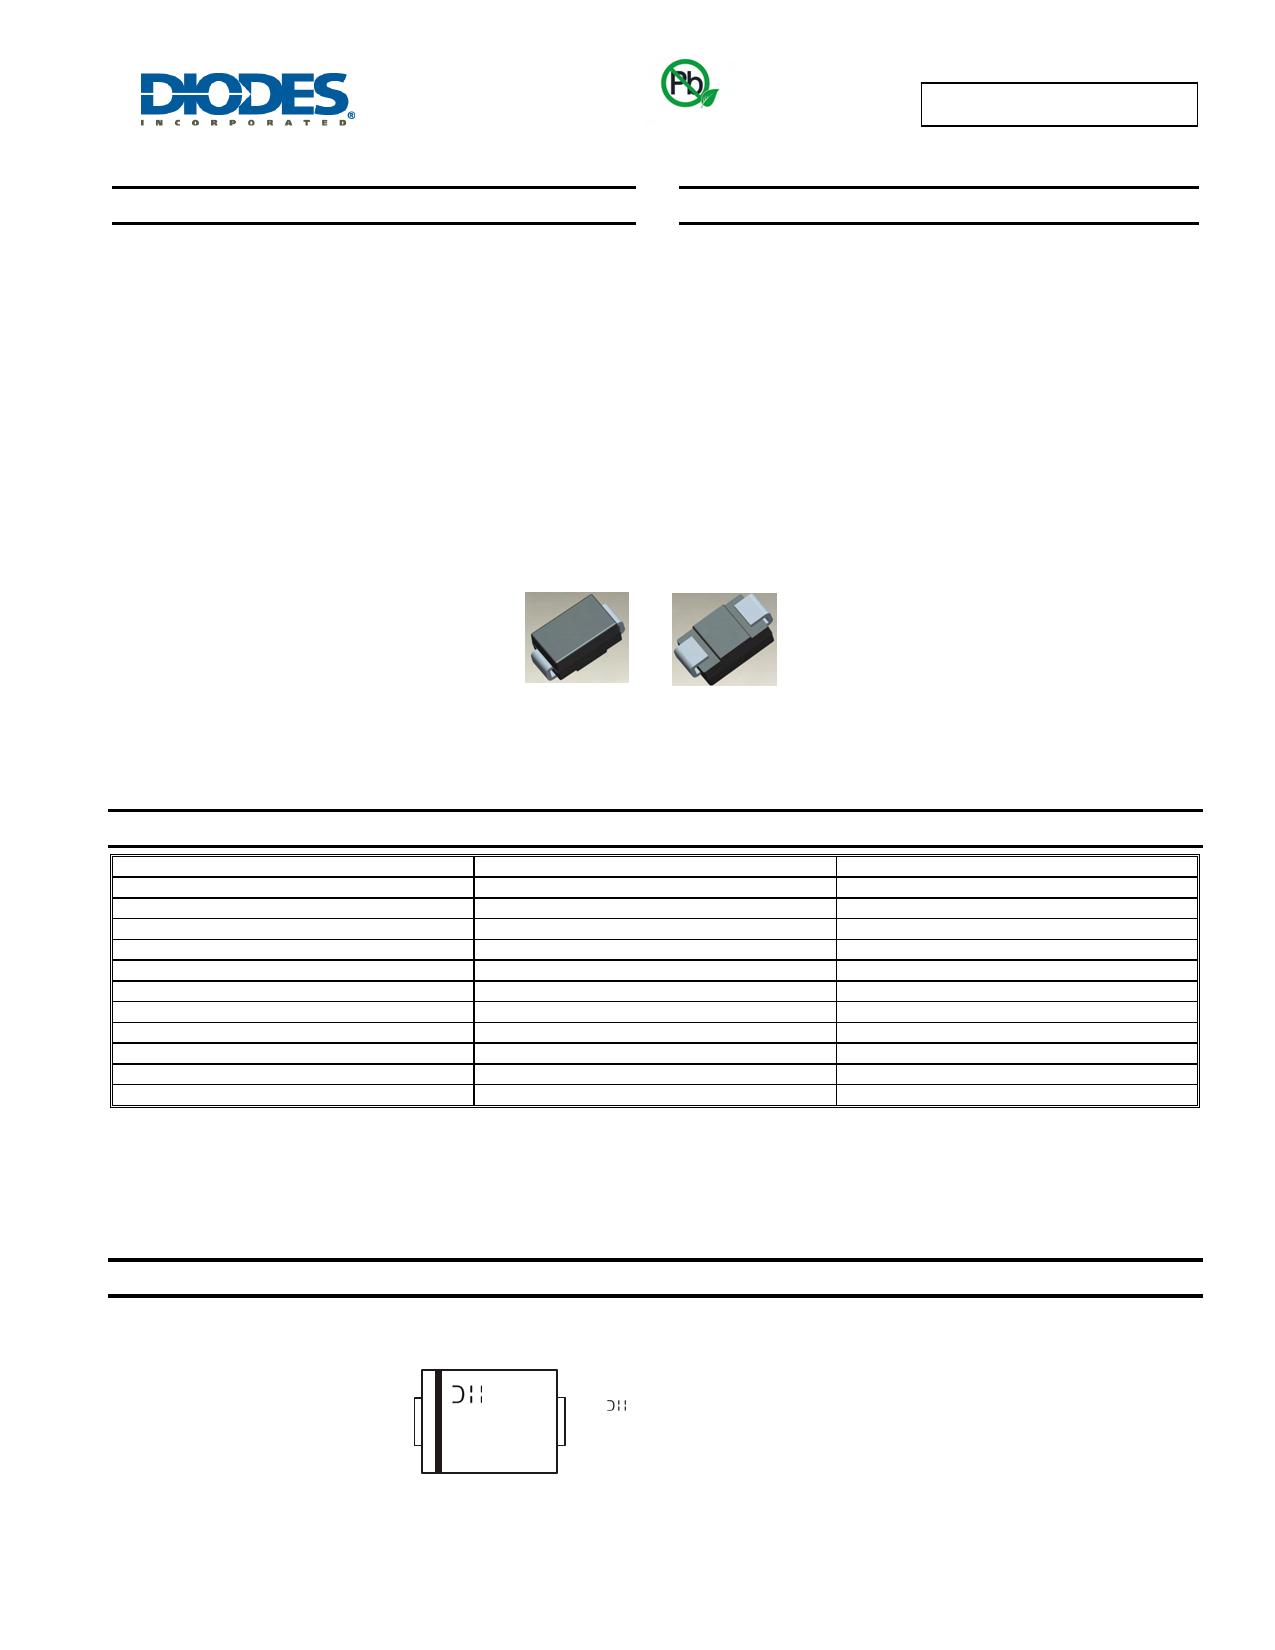 TB0720M datasheet